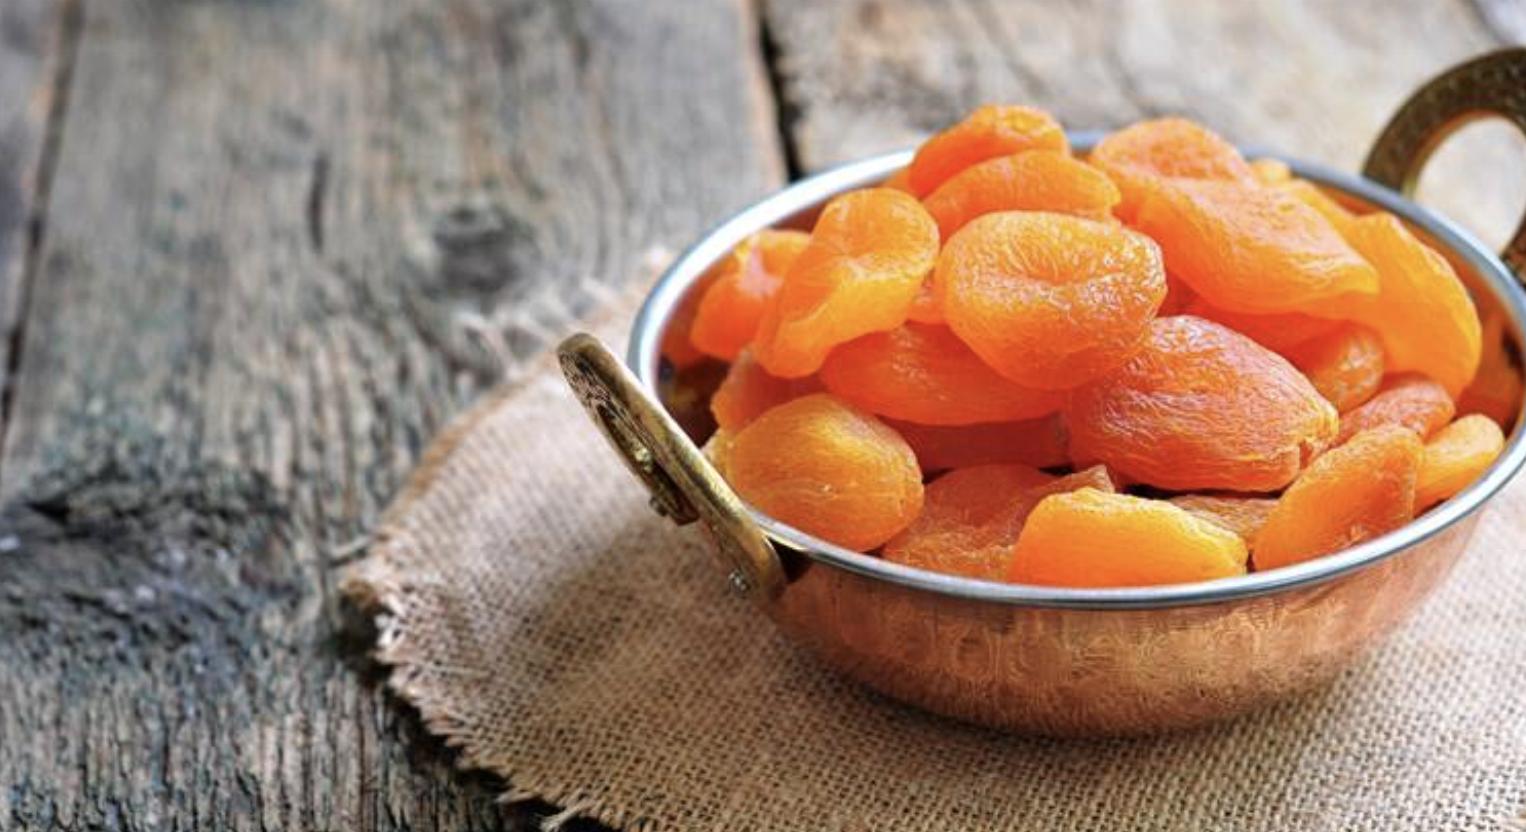 Сушеные абрикосы размера 1, турецкие абрикосы, сушеные абрикосы, сухие фрукты из Турции